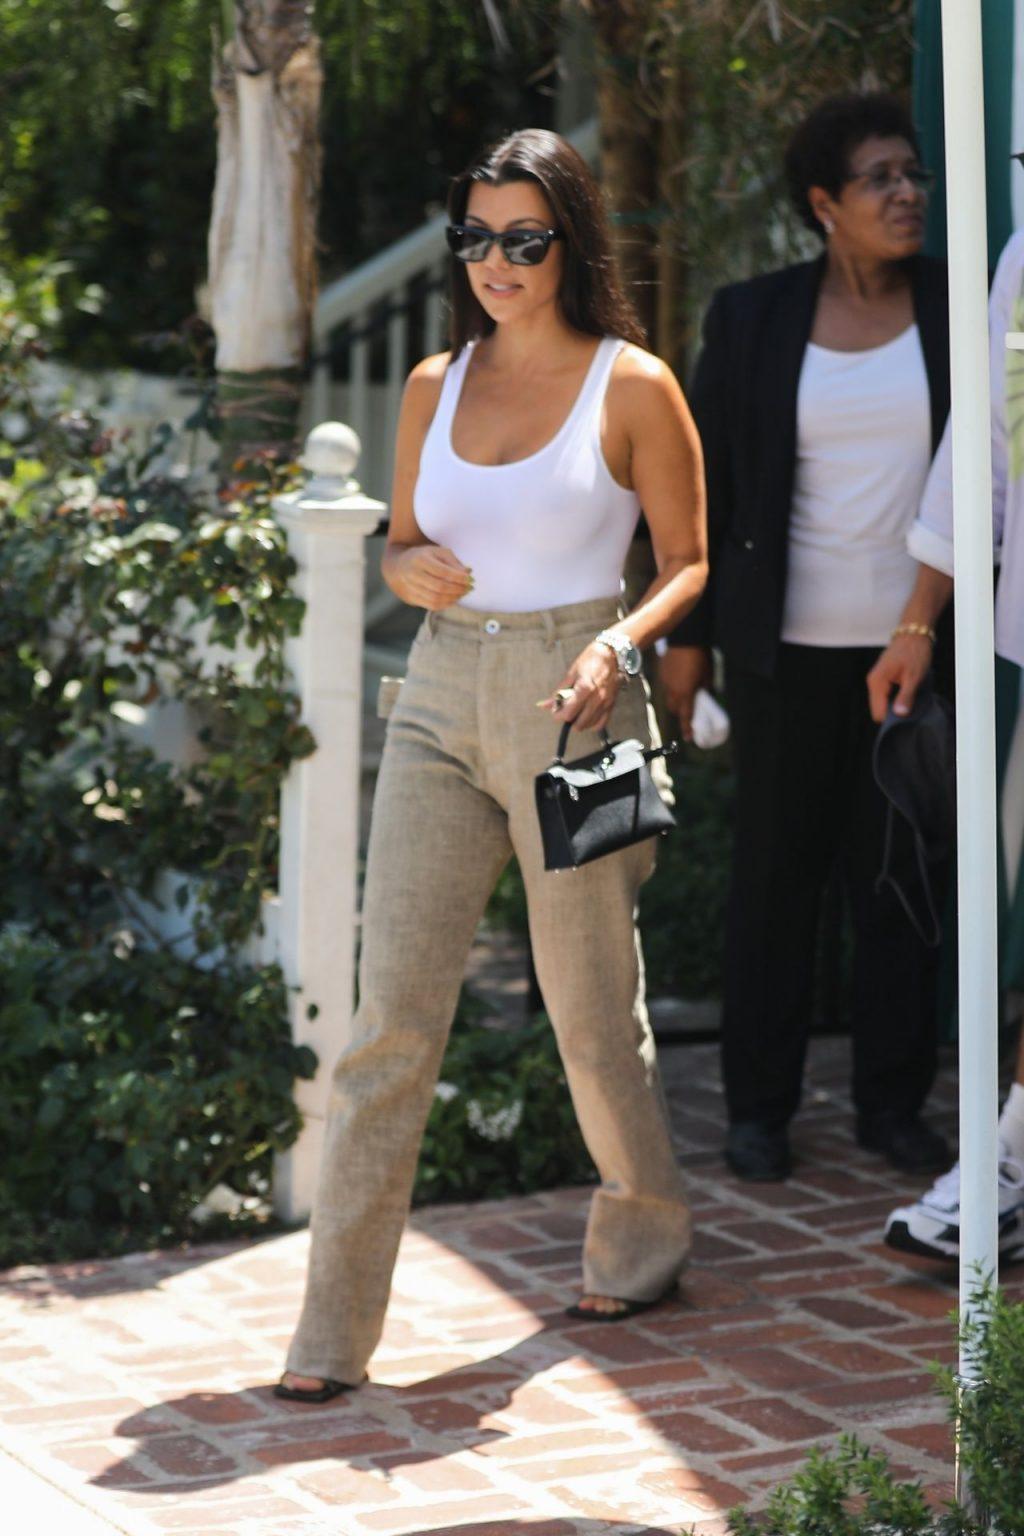 Kourtney Kardashian See Through Thefappeningblog Com 81 1024